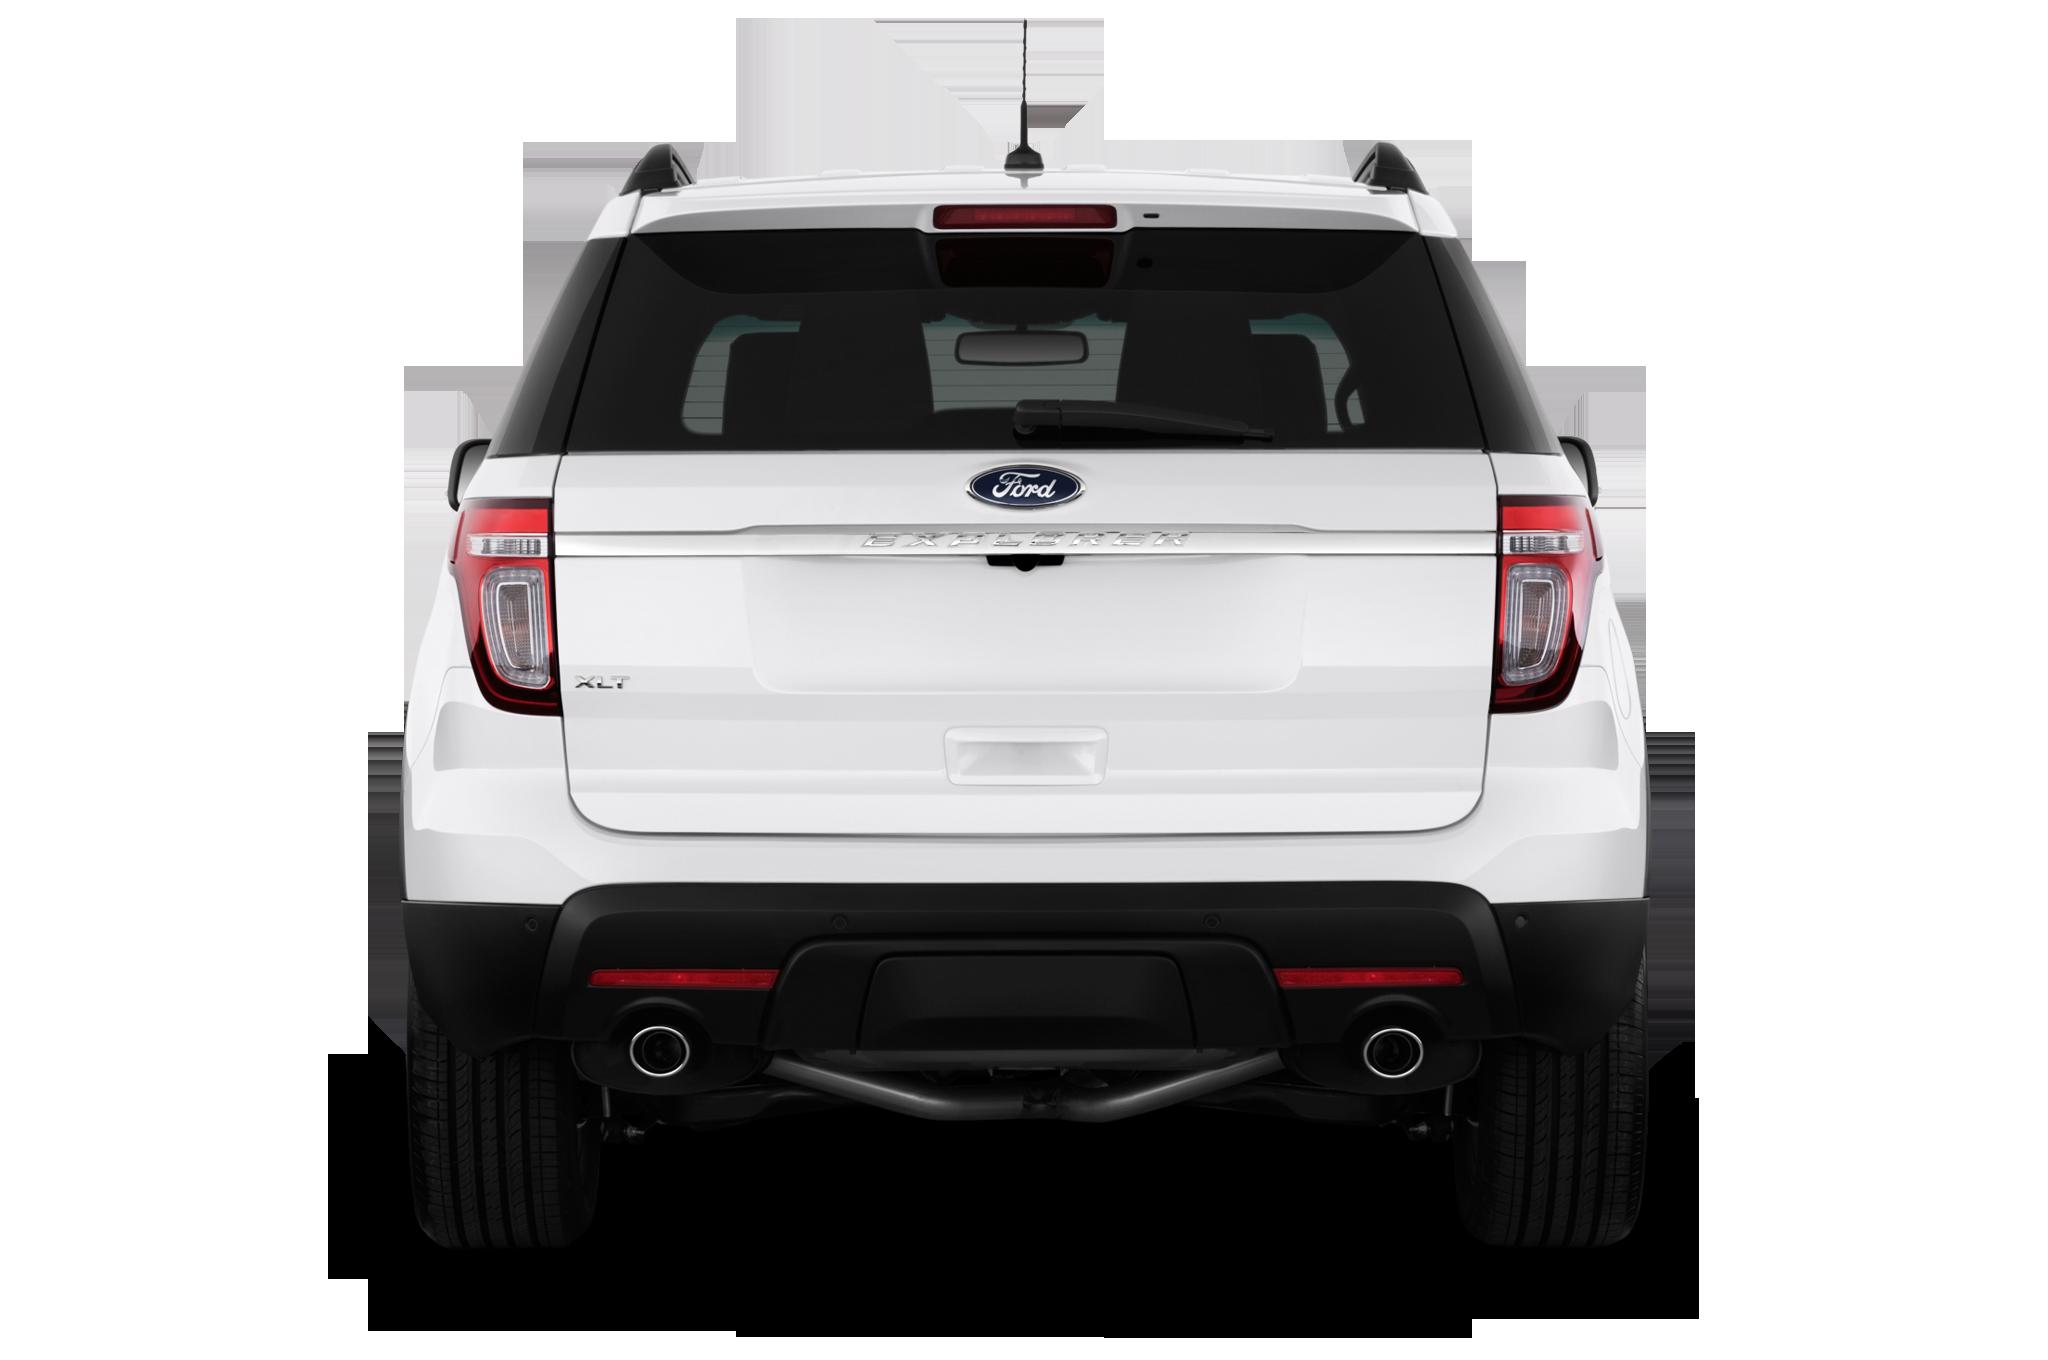 2014 ford explorer xlt suv rear view - Ford Explorer 2015 Xlt Black